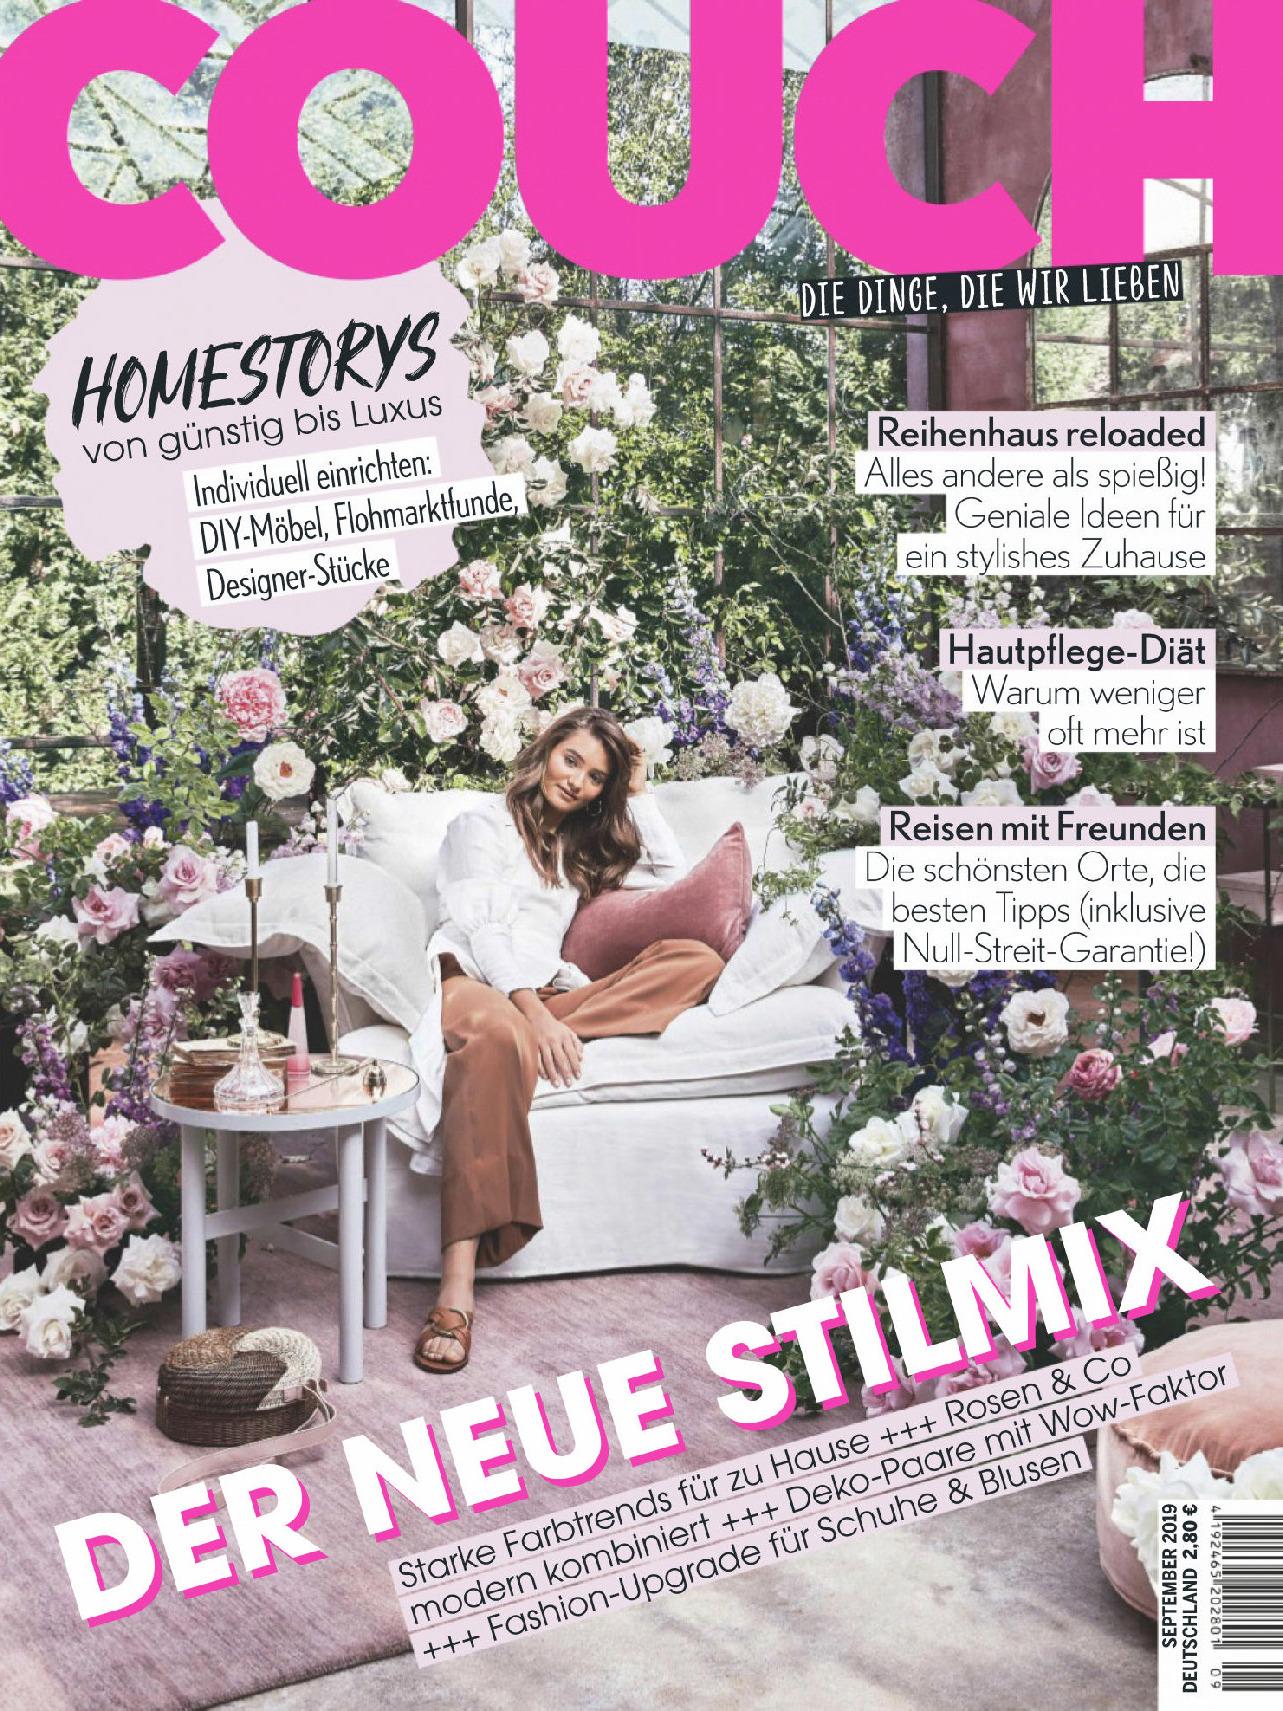 《Couch》德国版时尚家居设计杂志2019年09月号